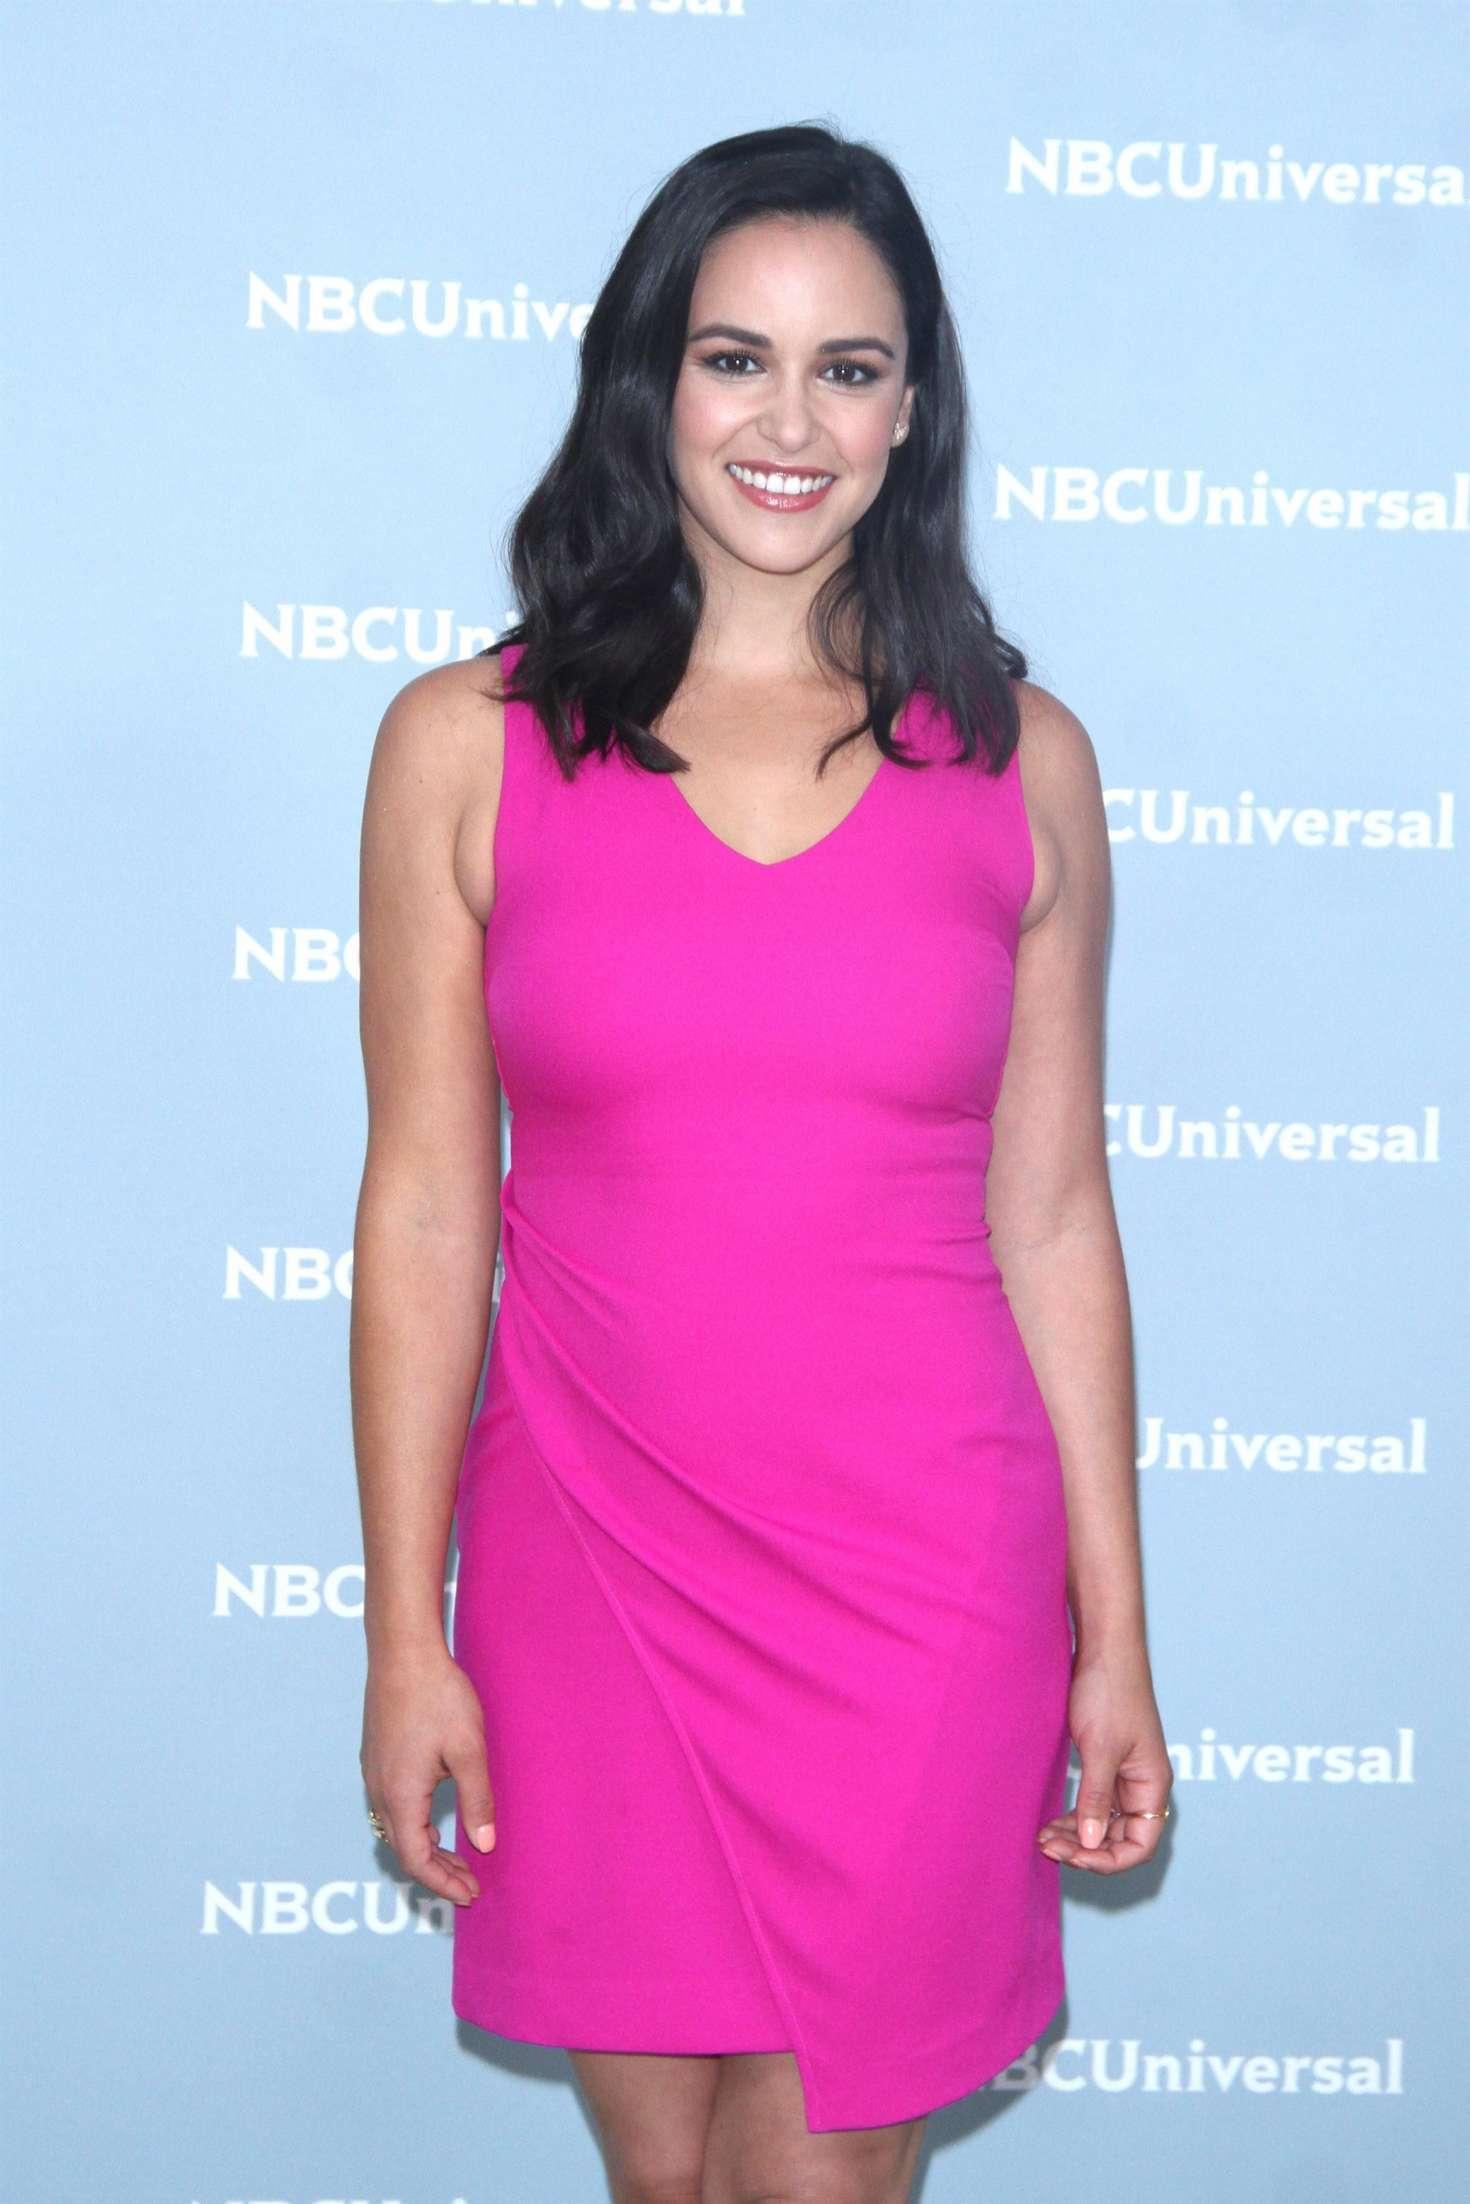 Melissa Fumero - 2018 NBCUniversal Upfront Presentation in NYC